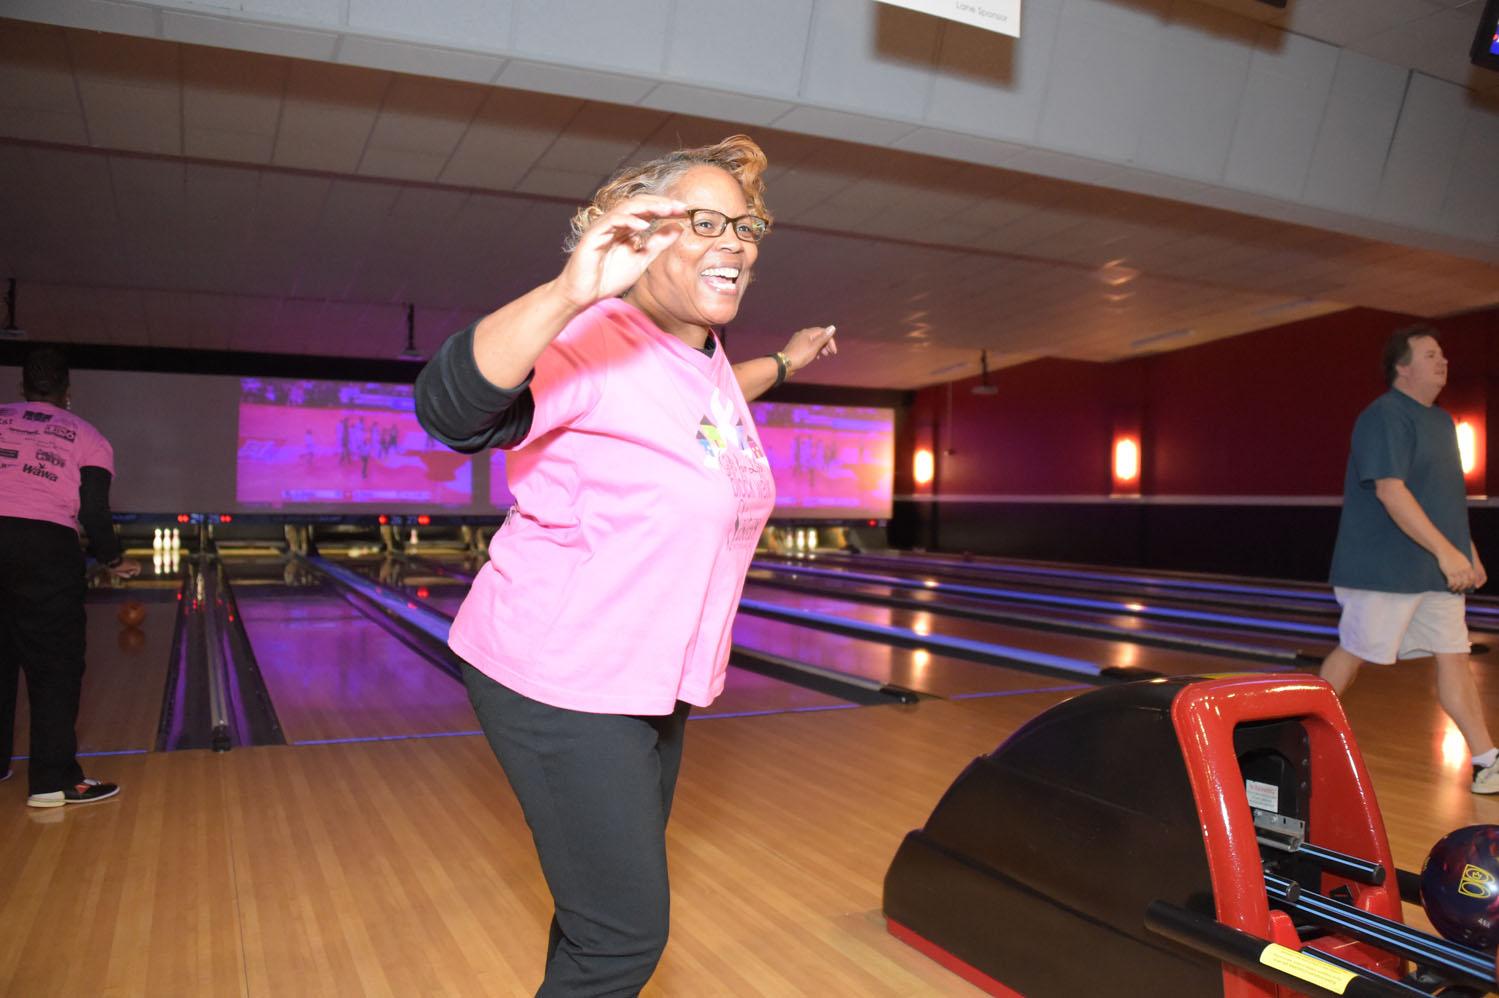 Bowling_20140108_211.jpg